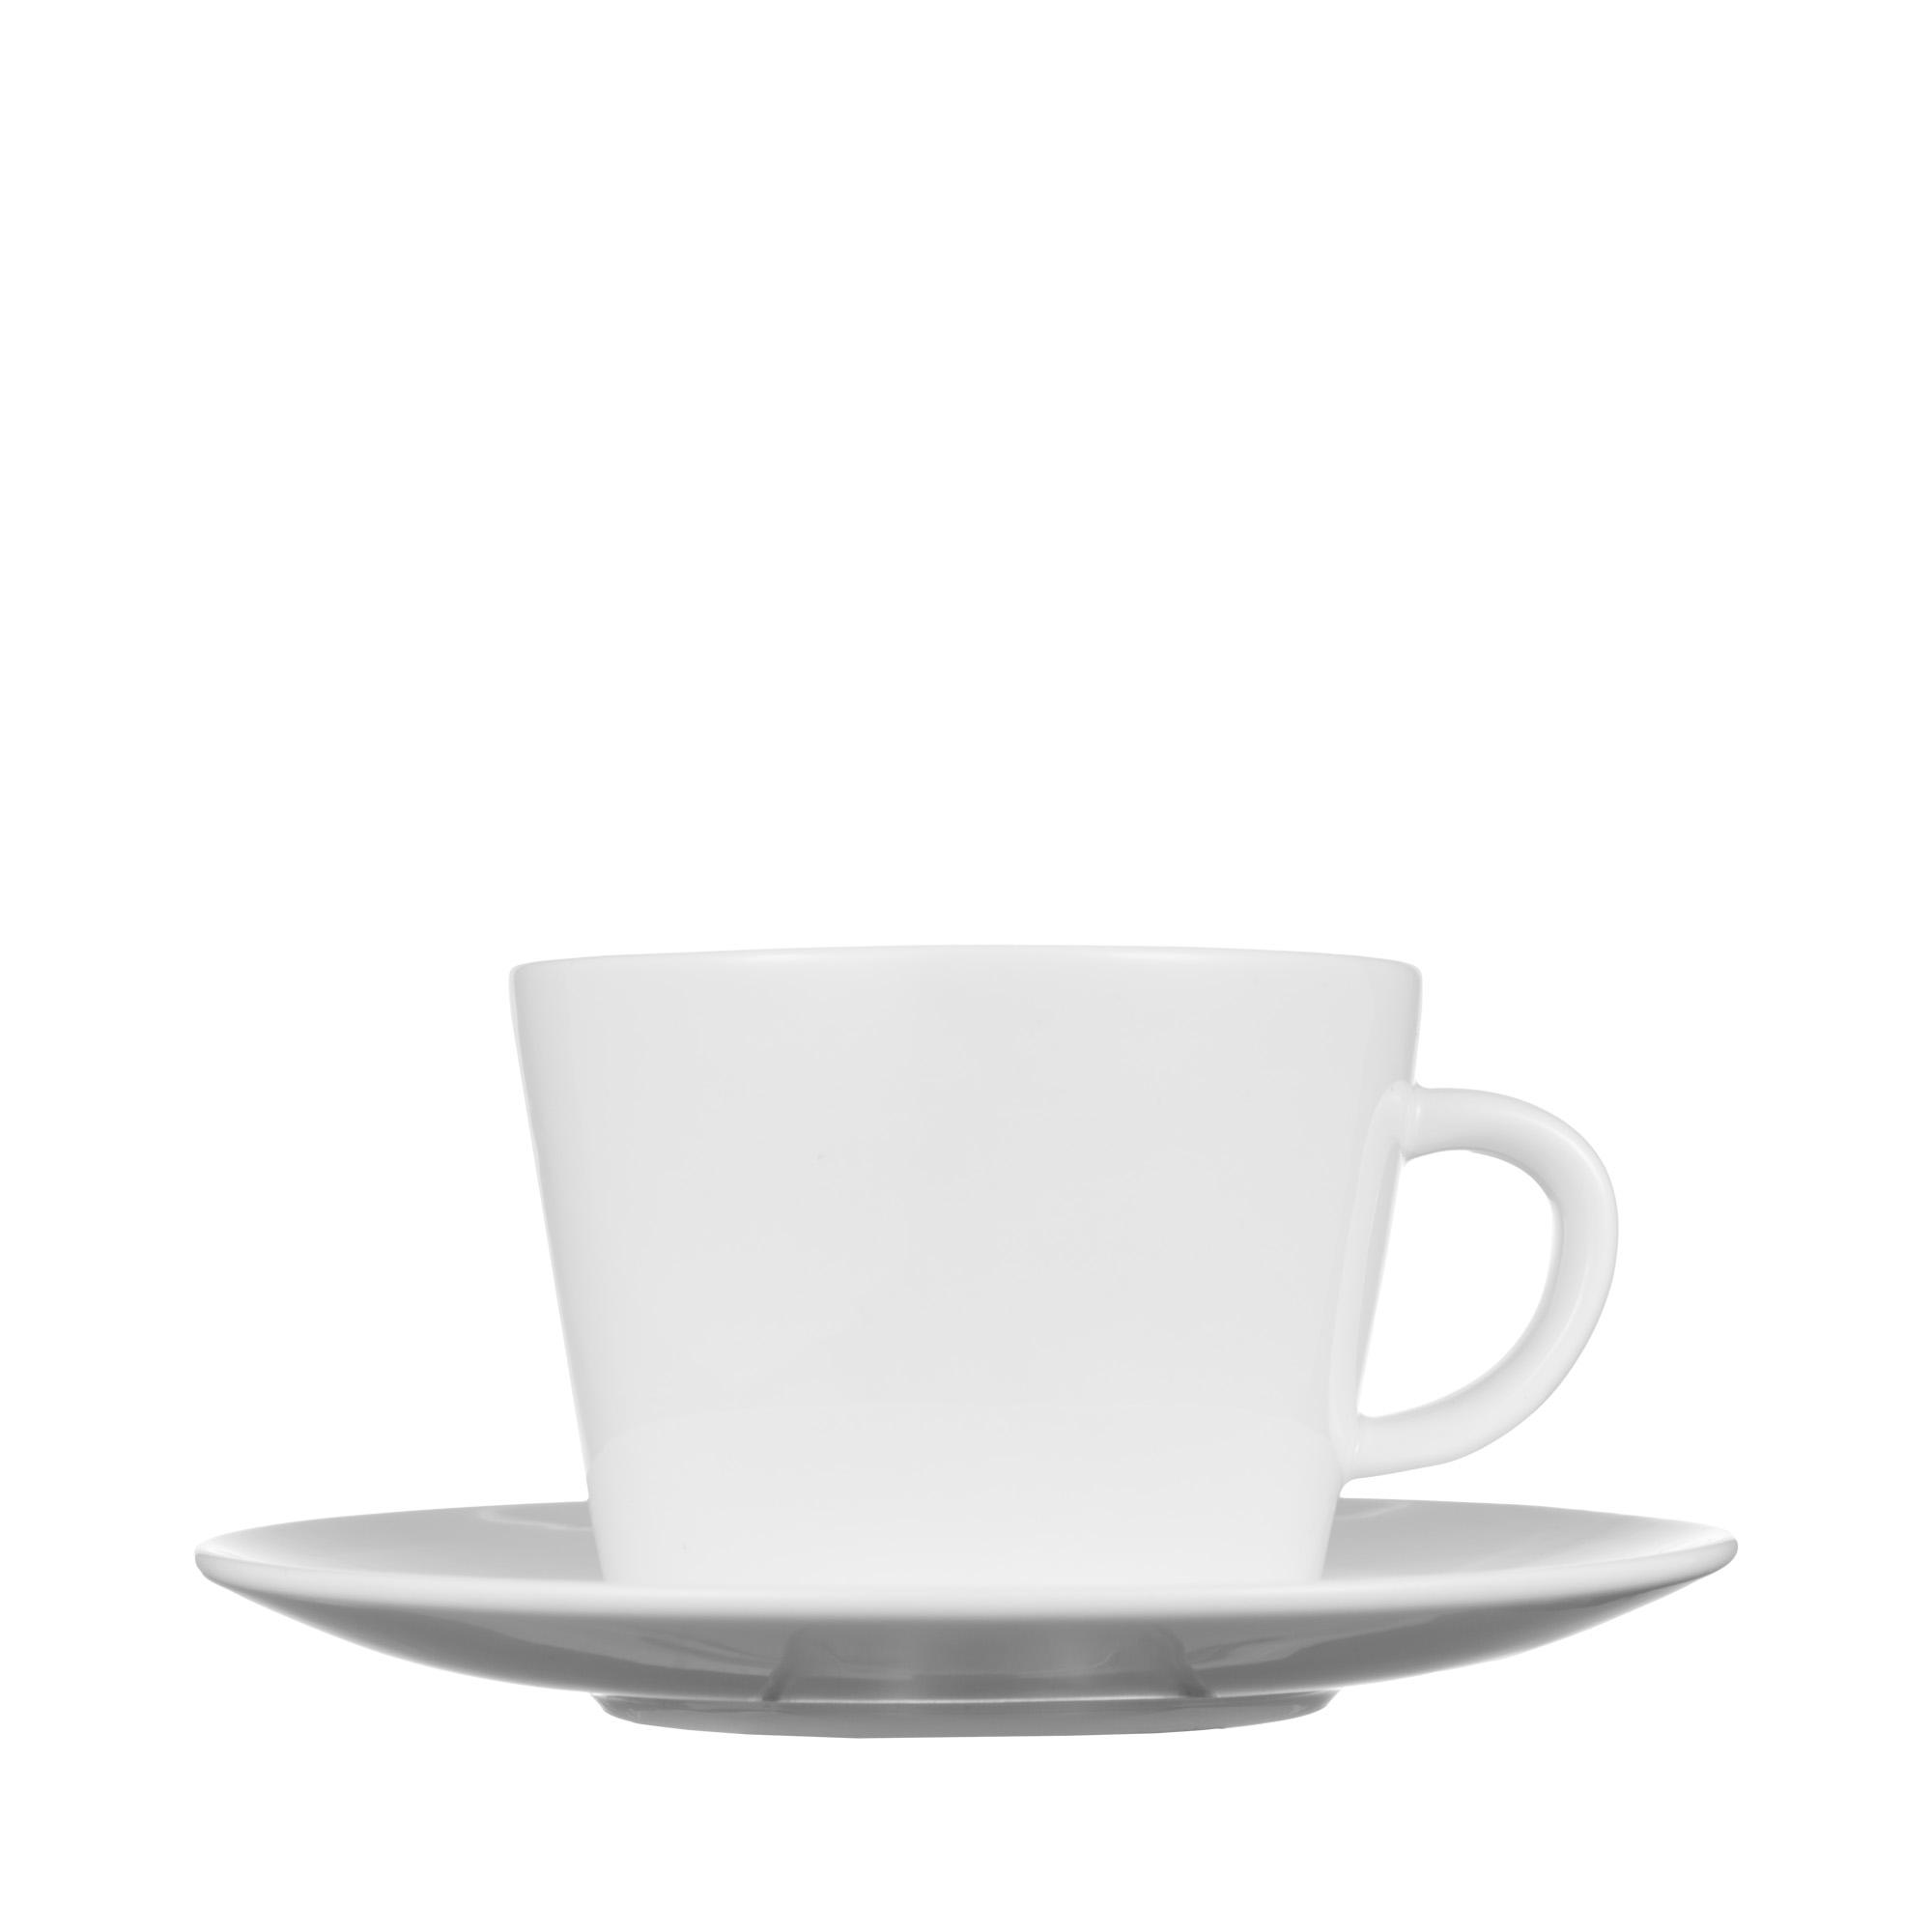 Чашка с блюдцем remember чашка для эспрессо с блюдцем black lines